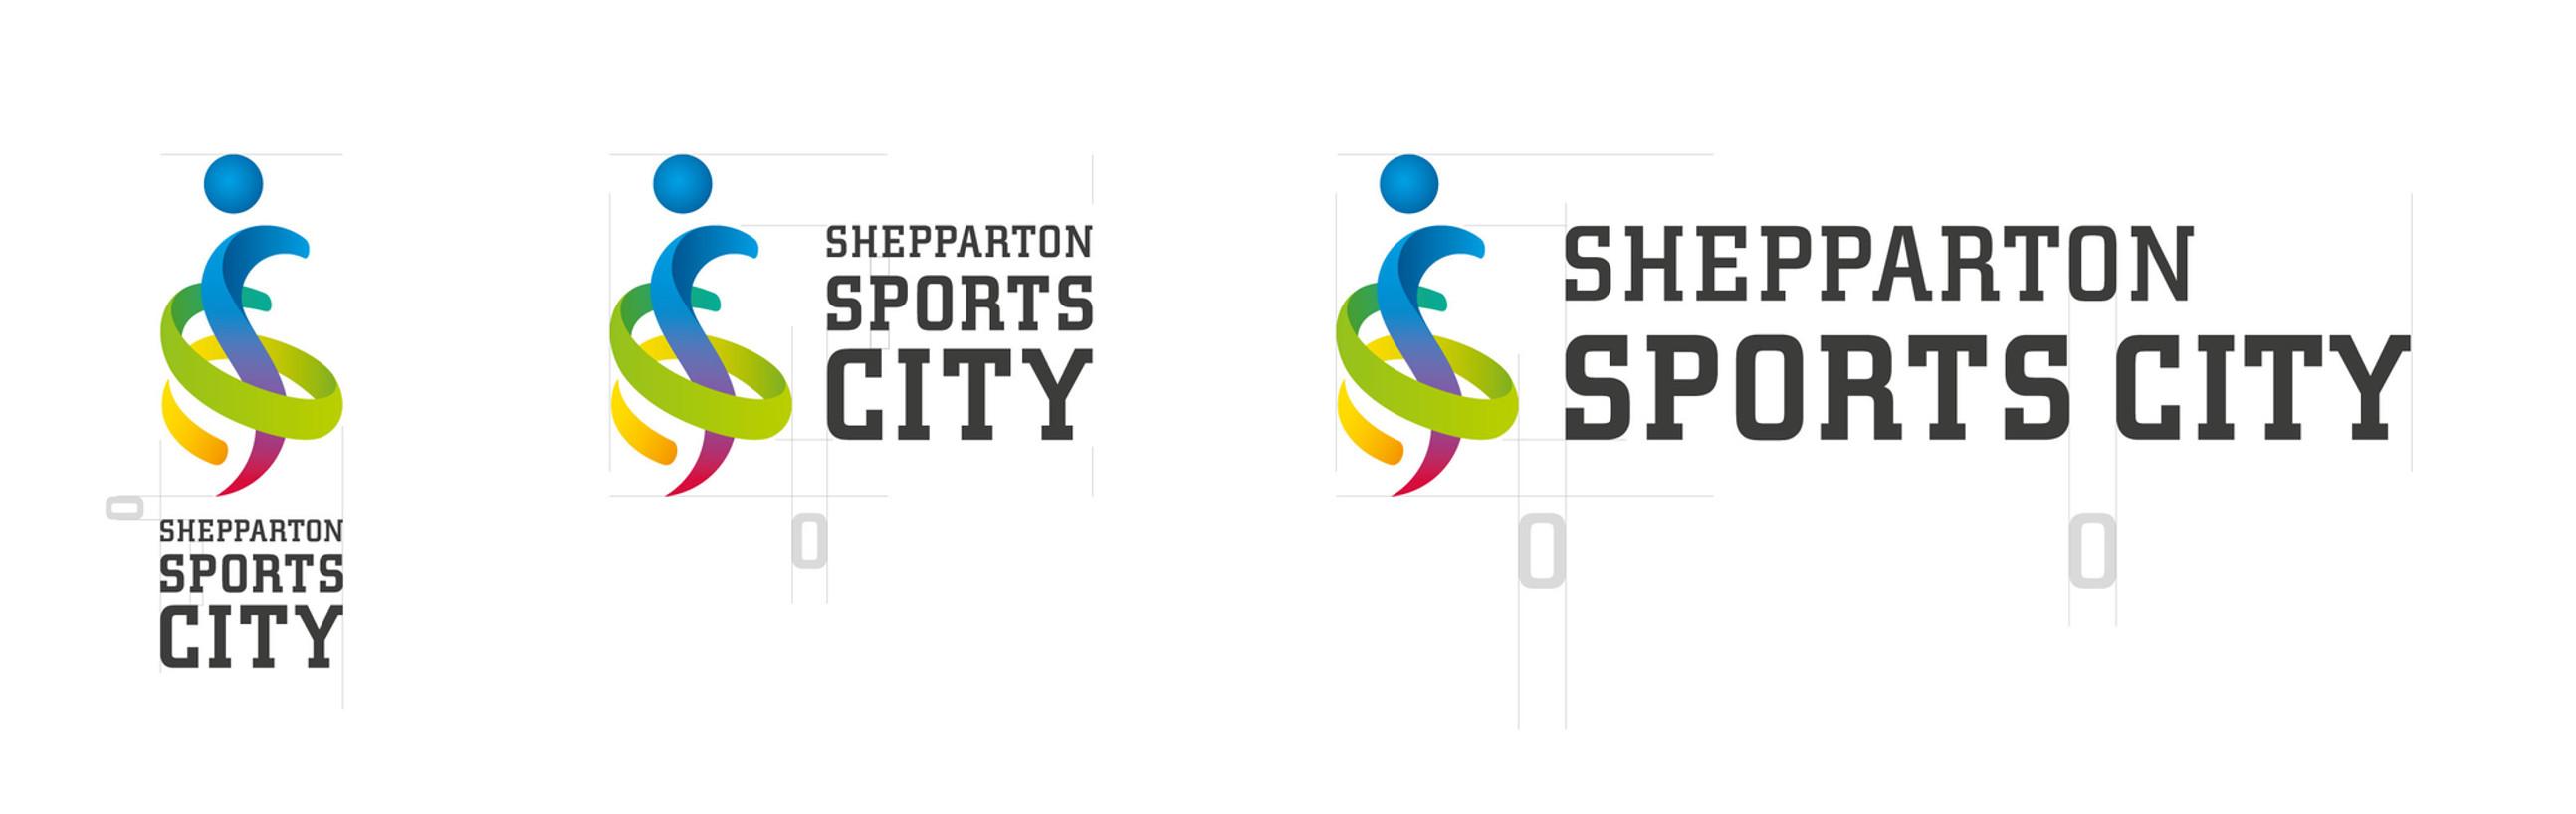 SportsCity_ID_1.jpg